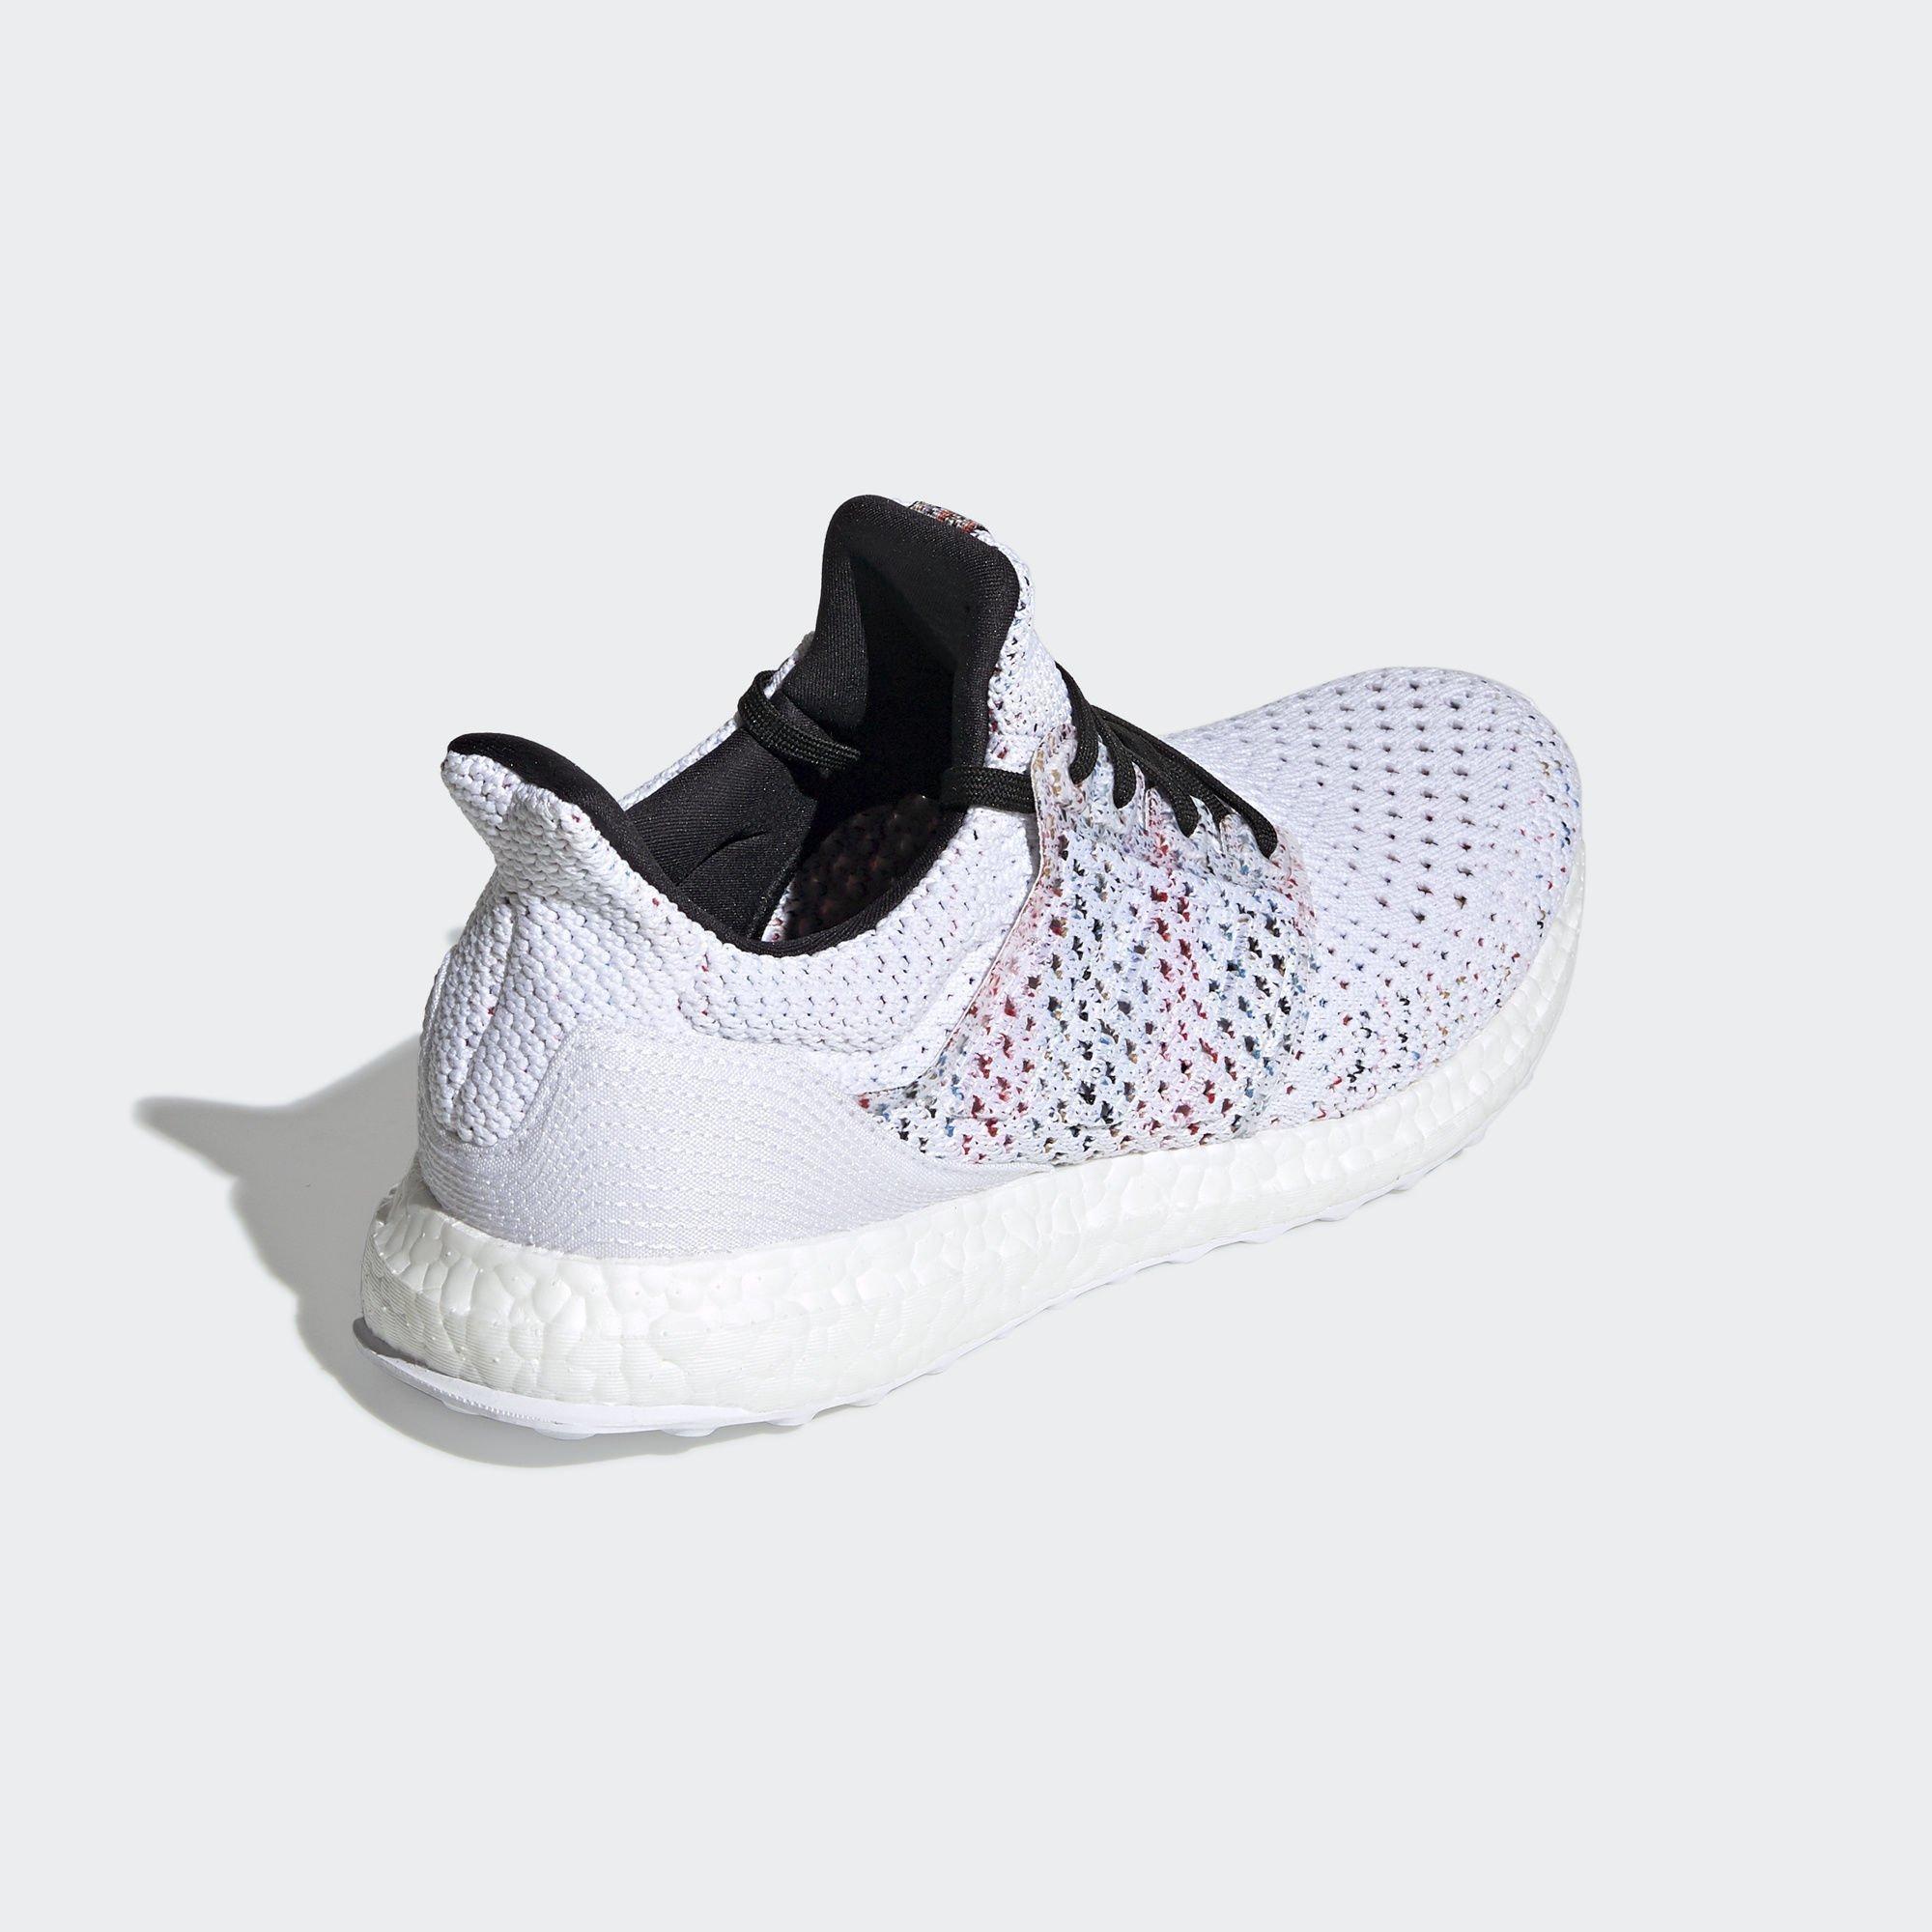 Missoni X adidas Ultraboost Clima 'Ftwr White' (D97744)